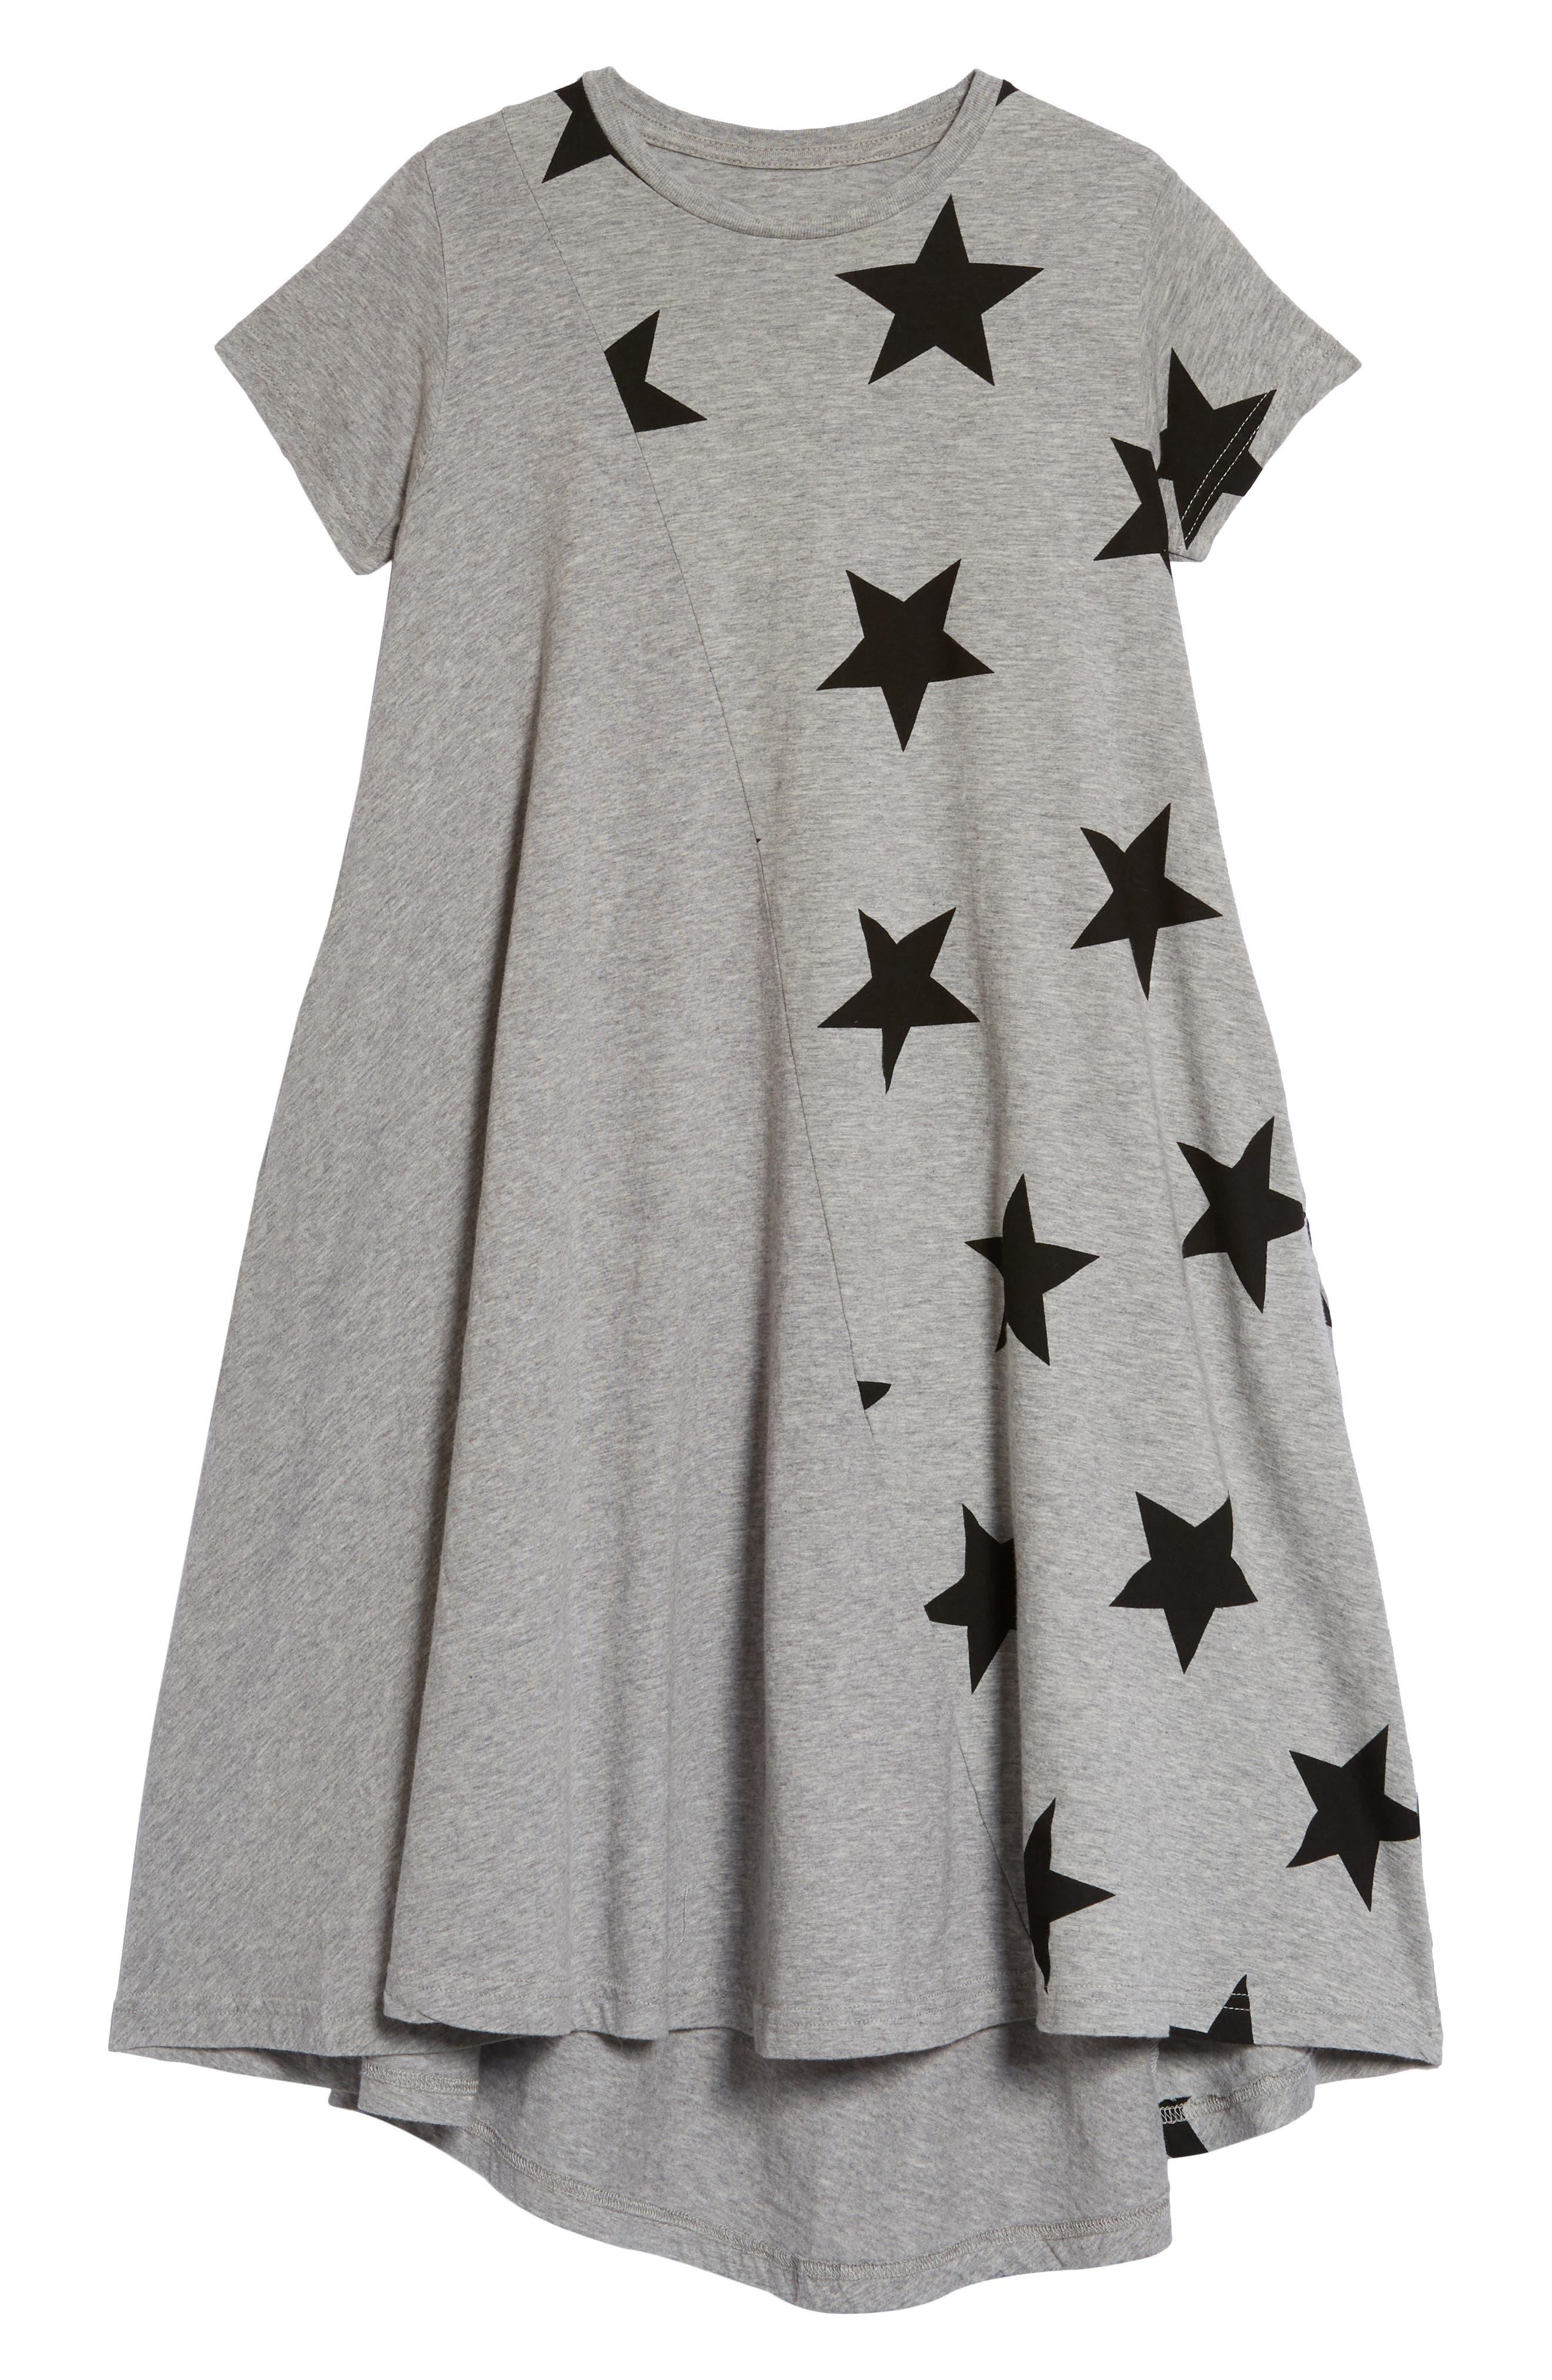 360 Star Print Dress,                             Main thumbnail 1, color,                             Heather Grey